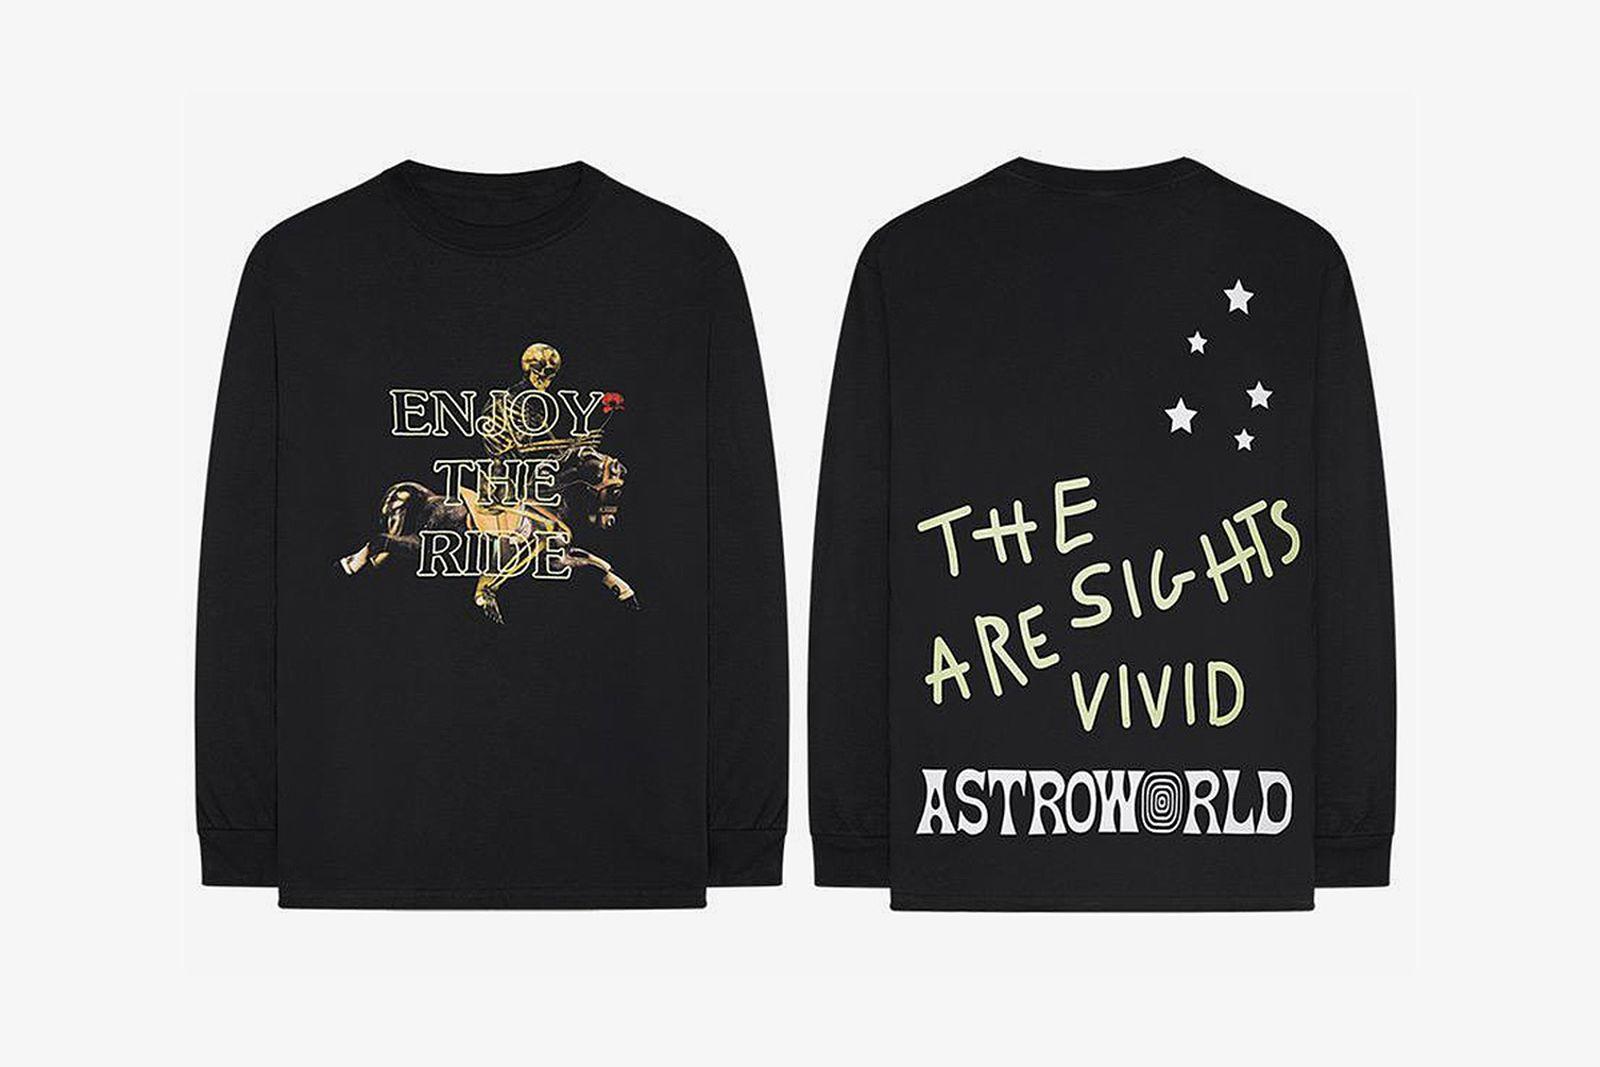 travis scott astroworld merch collection main ASAP Ferg Merchandise brockhampton